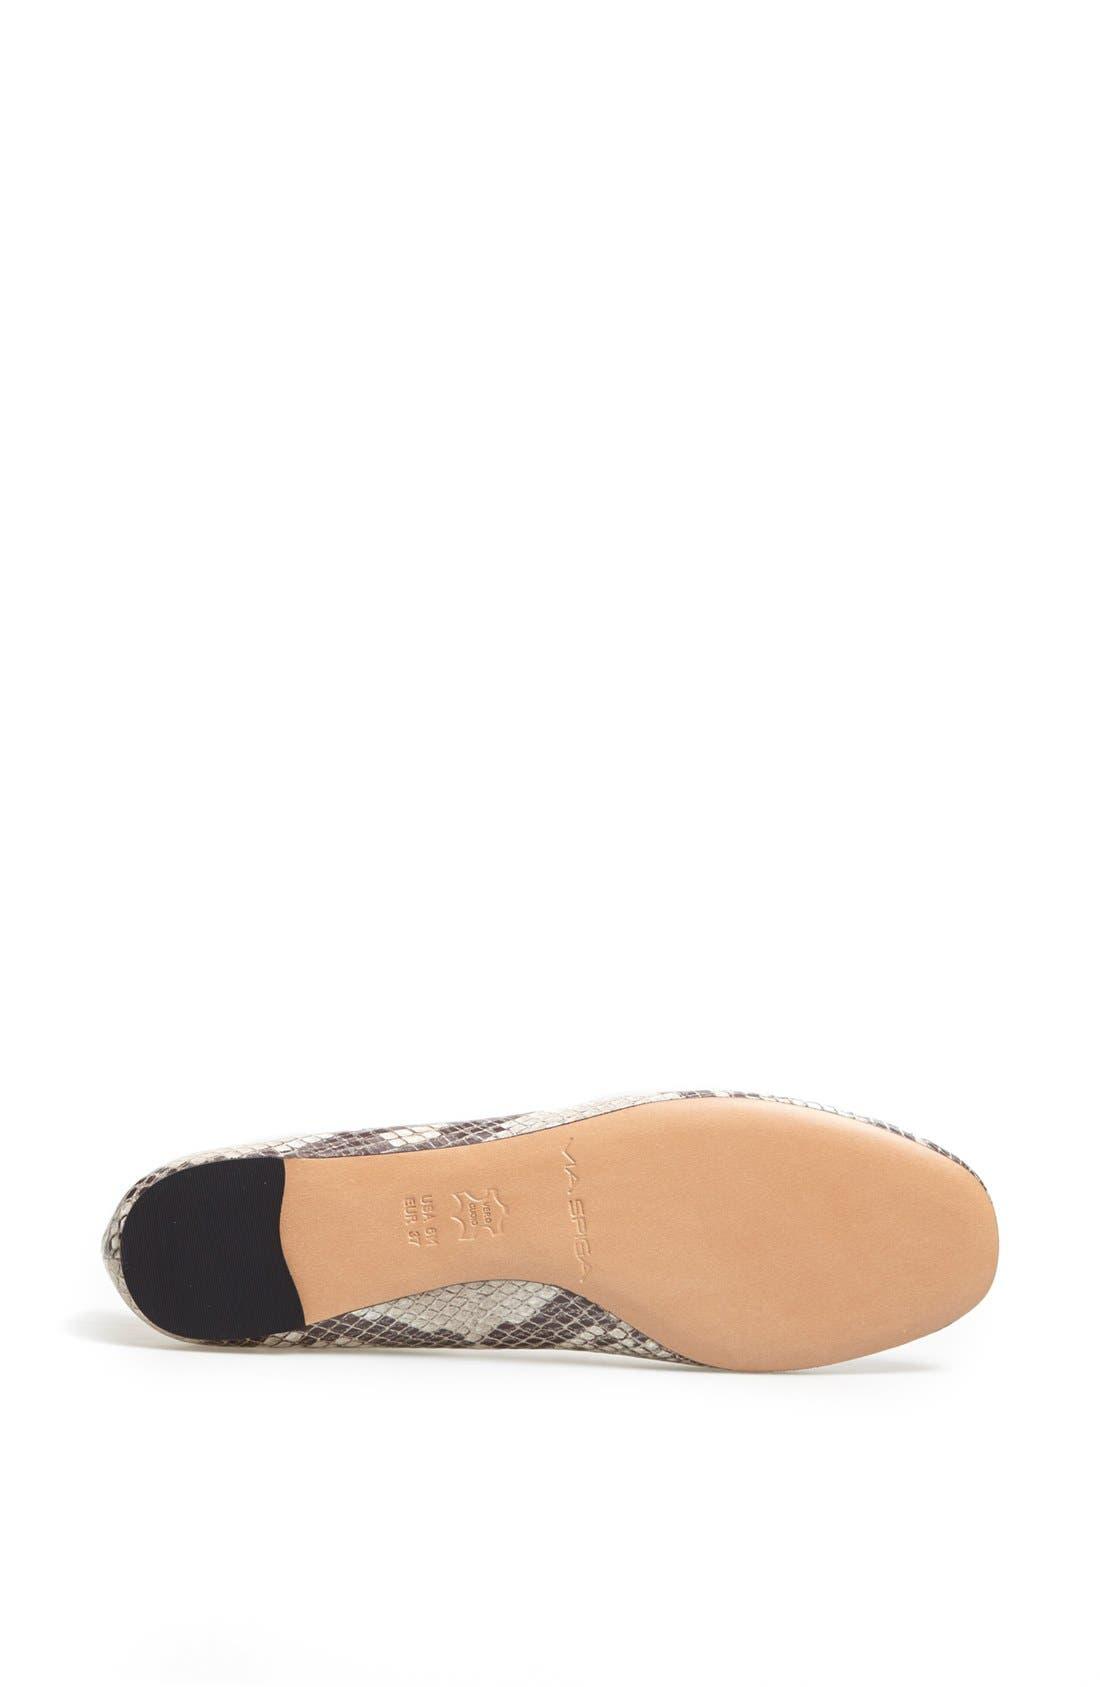 Alternate Image 4  - Via Spiga 'Lilac' Ballerina Flat